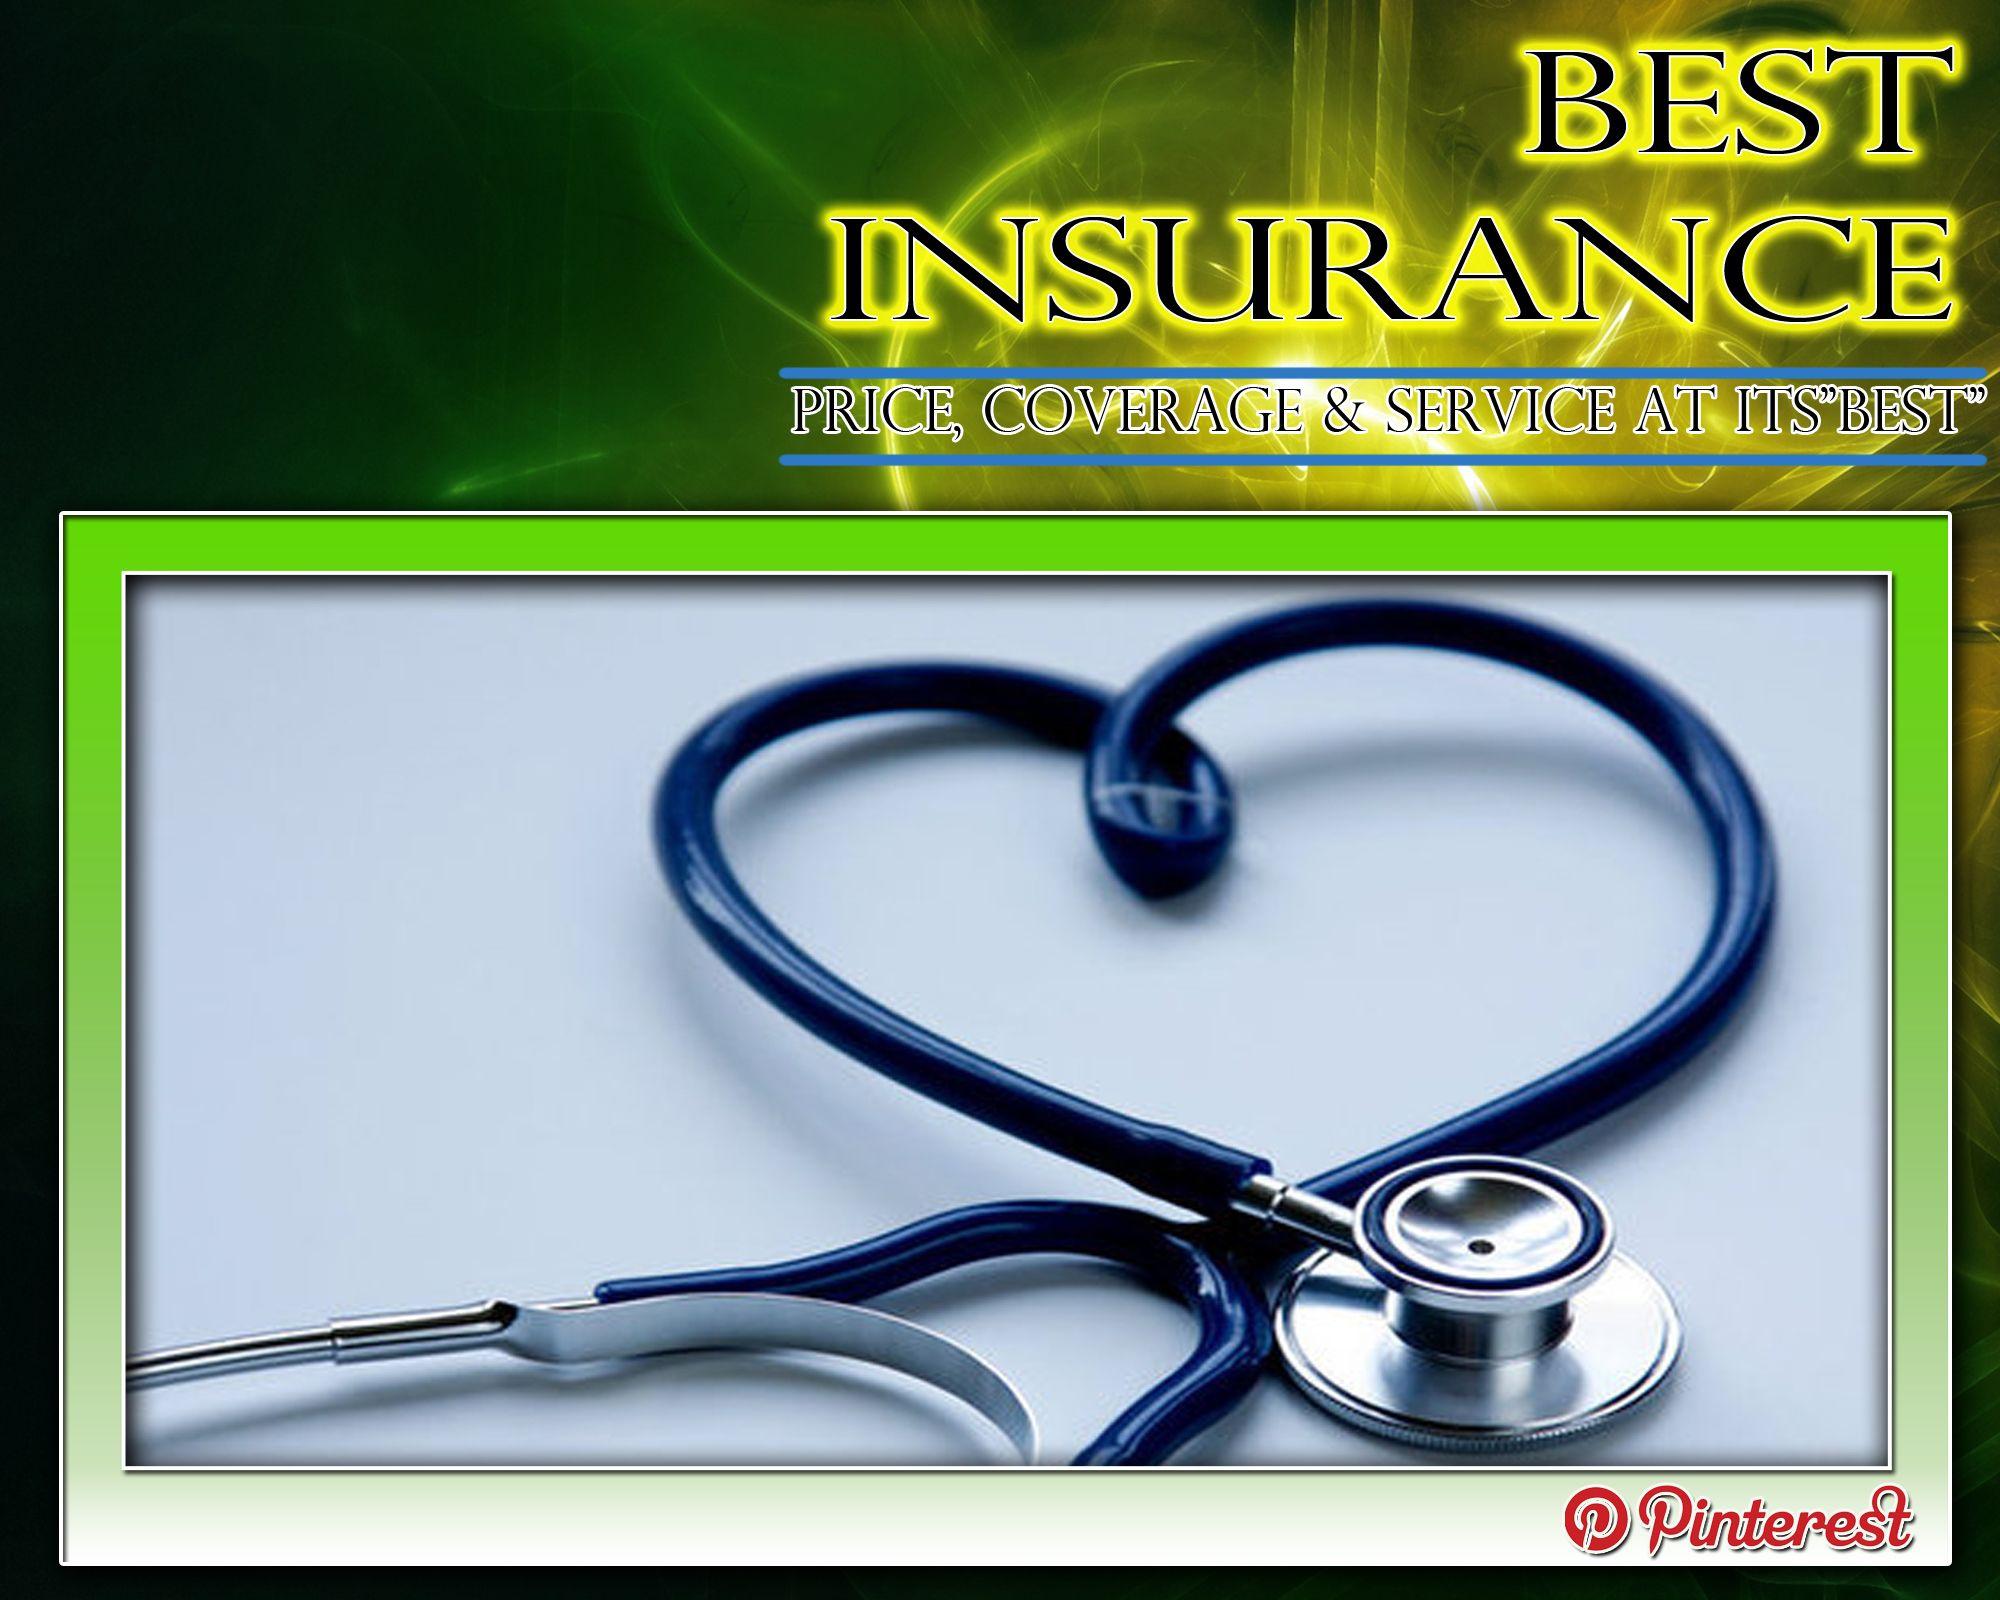 Health Insurance Quotes Florida Automobileinsuranceft.lauderdale National Health Insurance